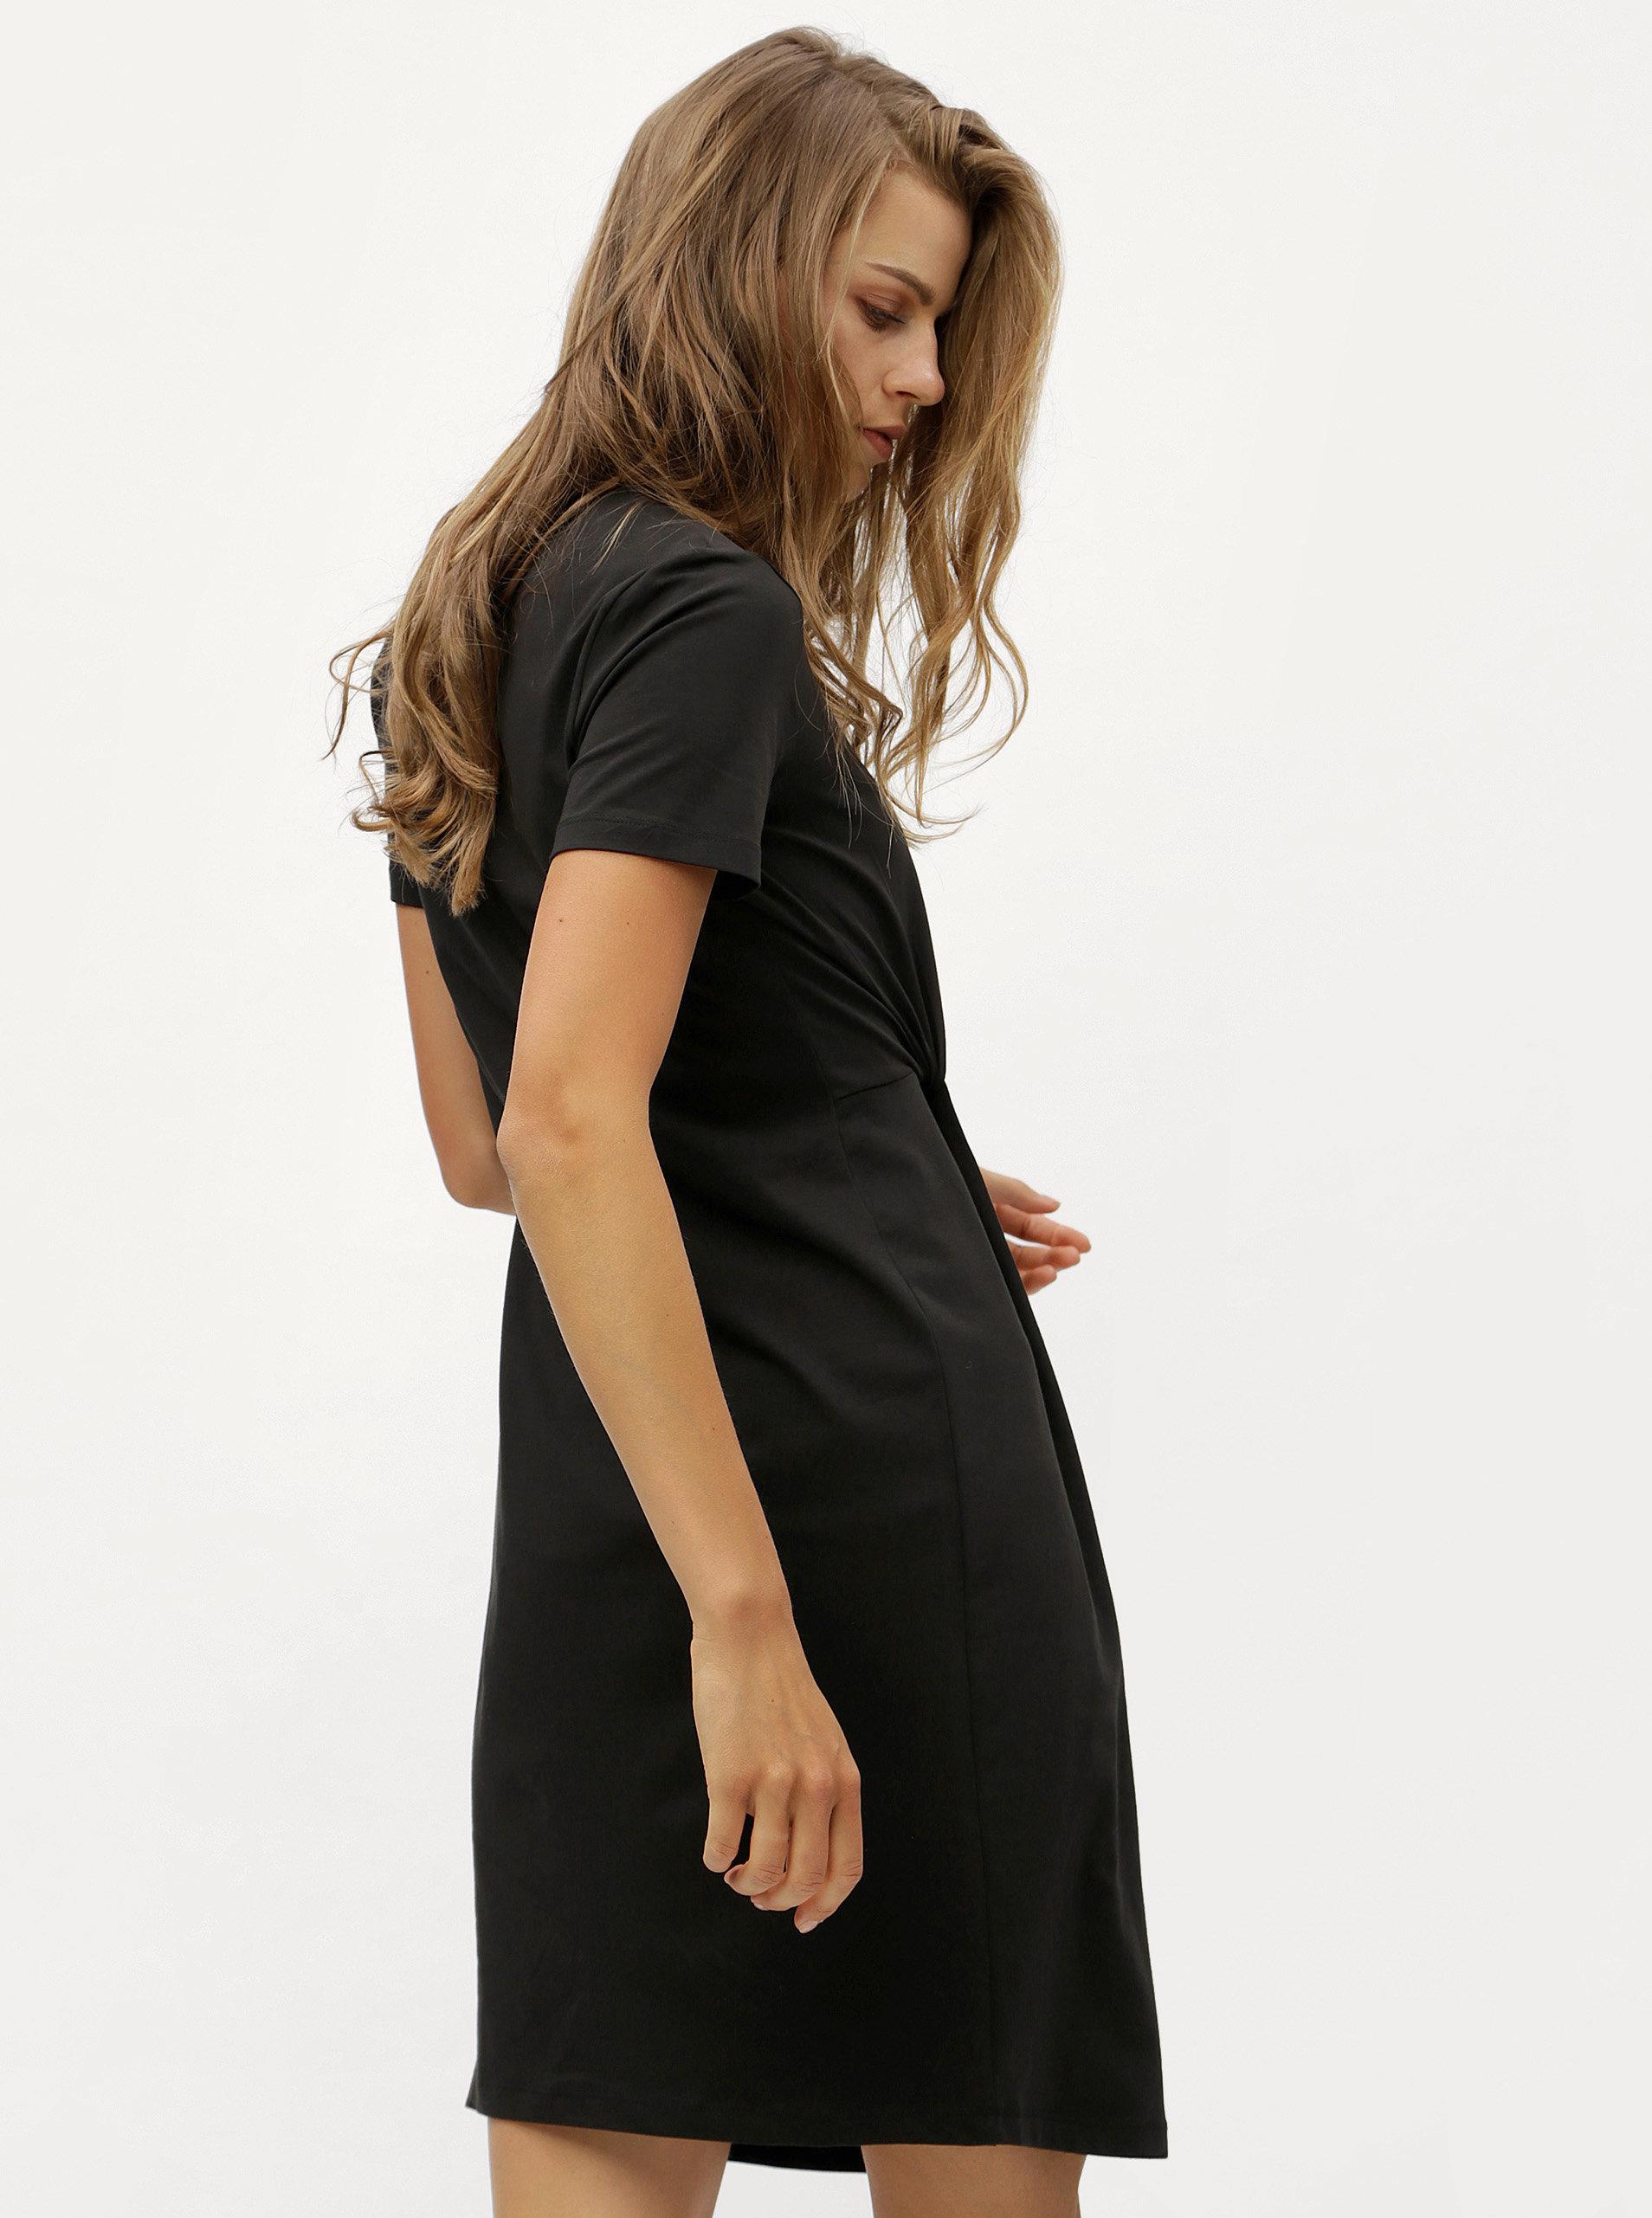 5cca875645d8 Čierne šaty s uzlom Jacqueline de Yong Domino ...